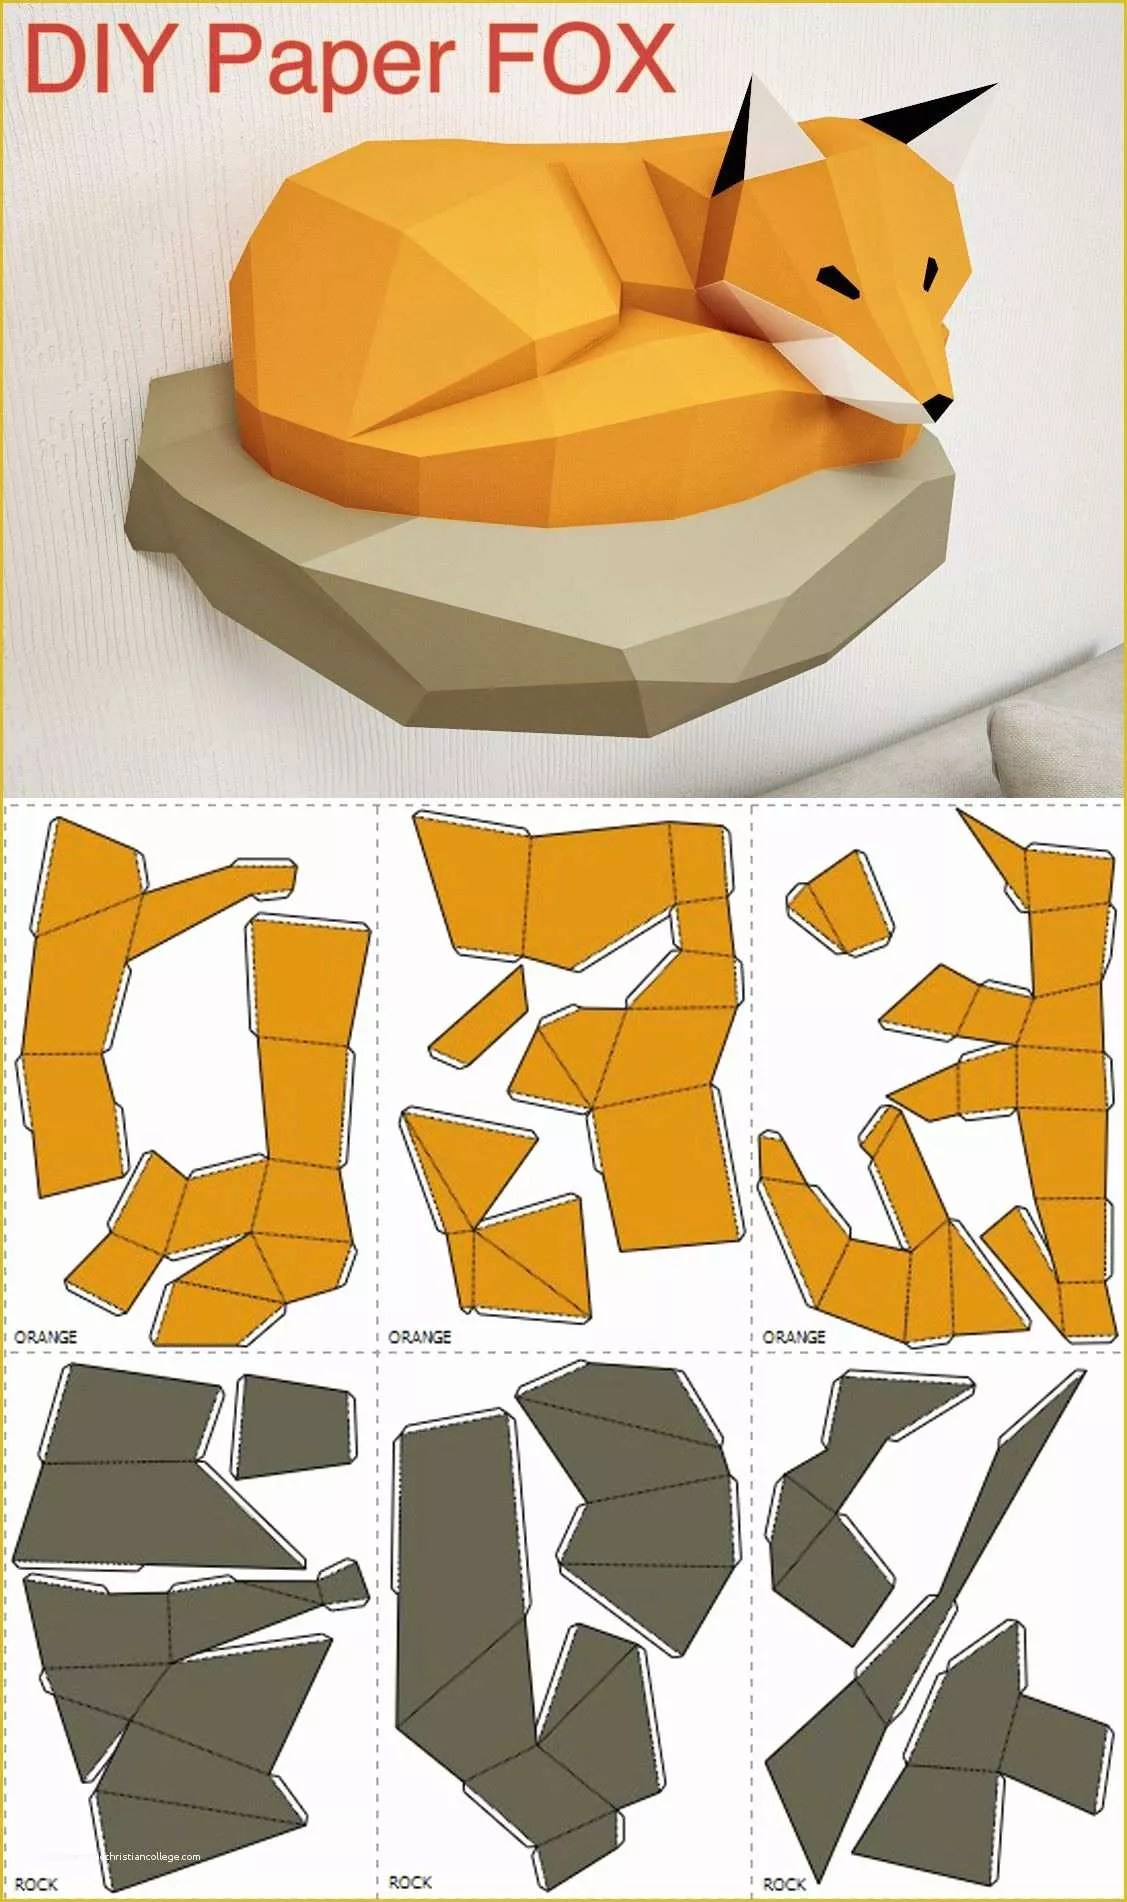 Free Papercraft Templates Of Papercraft Fox On Rock